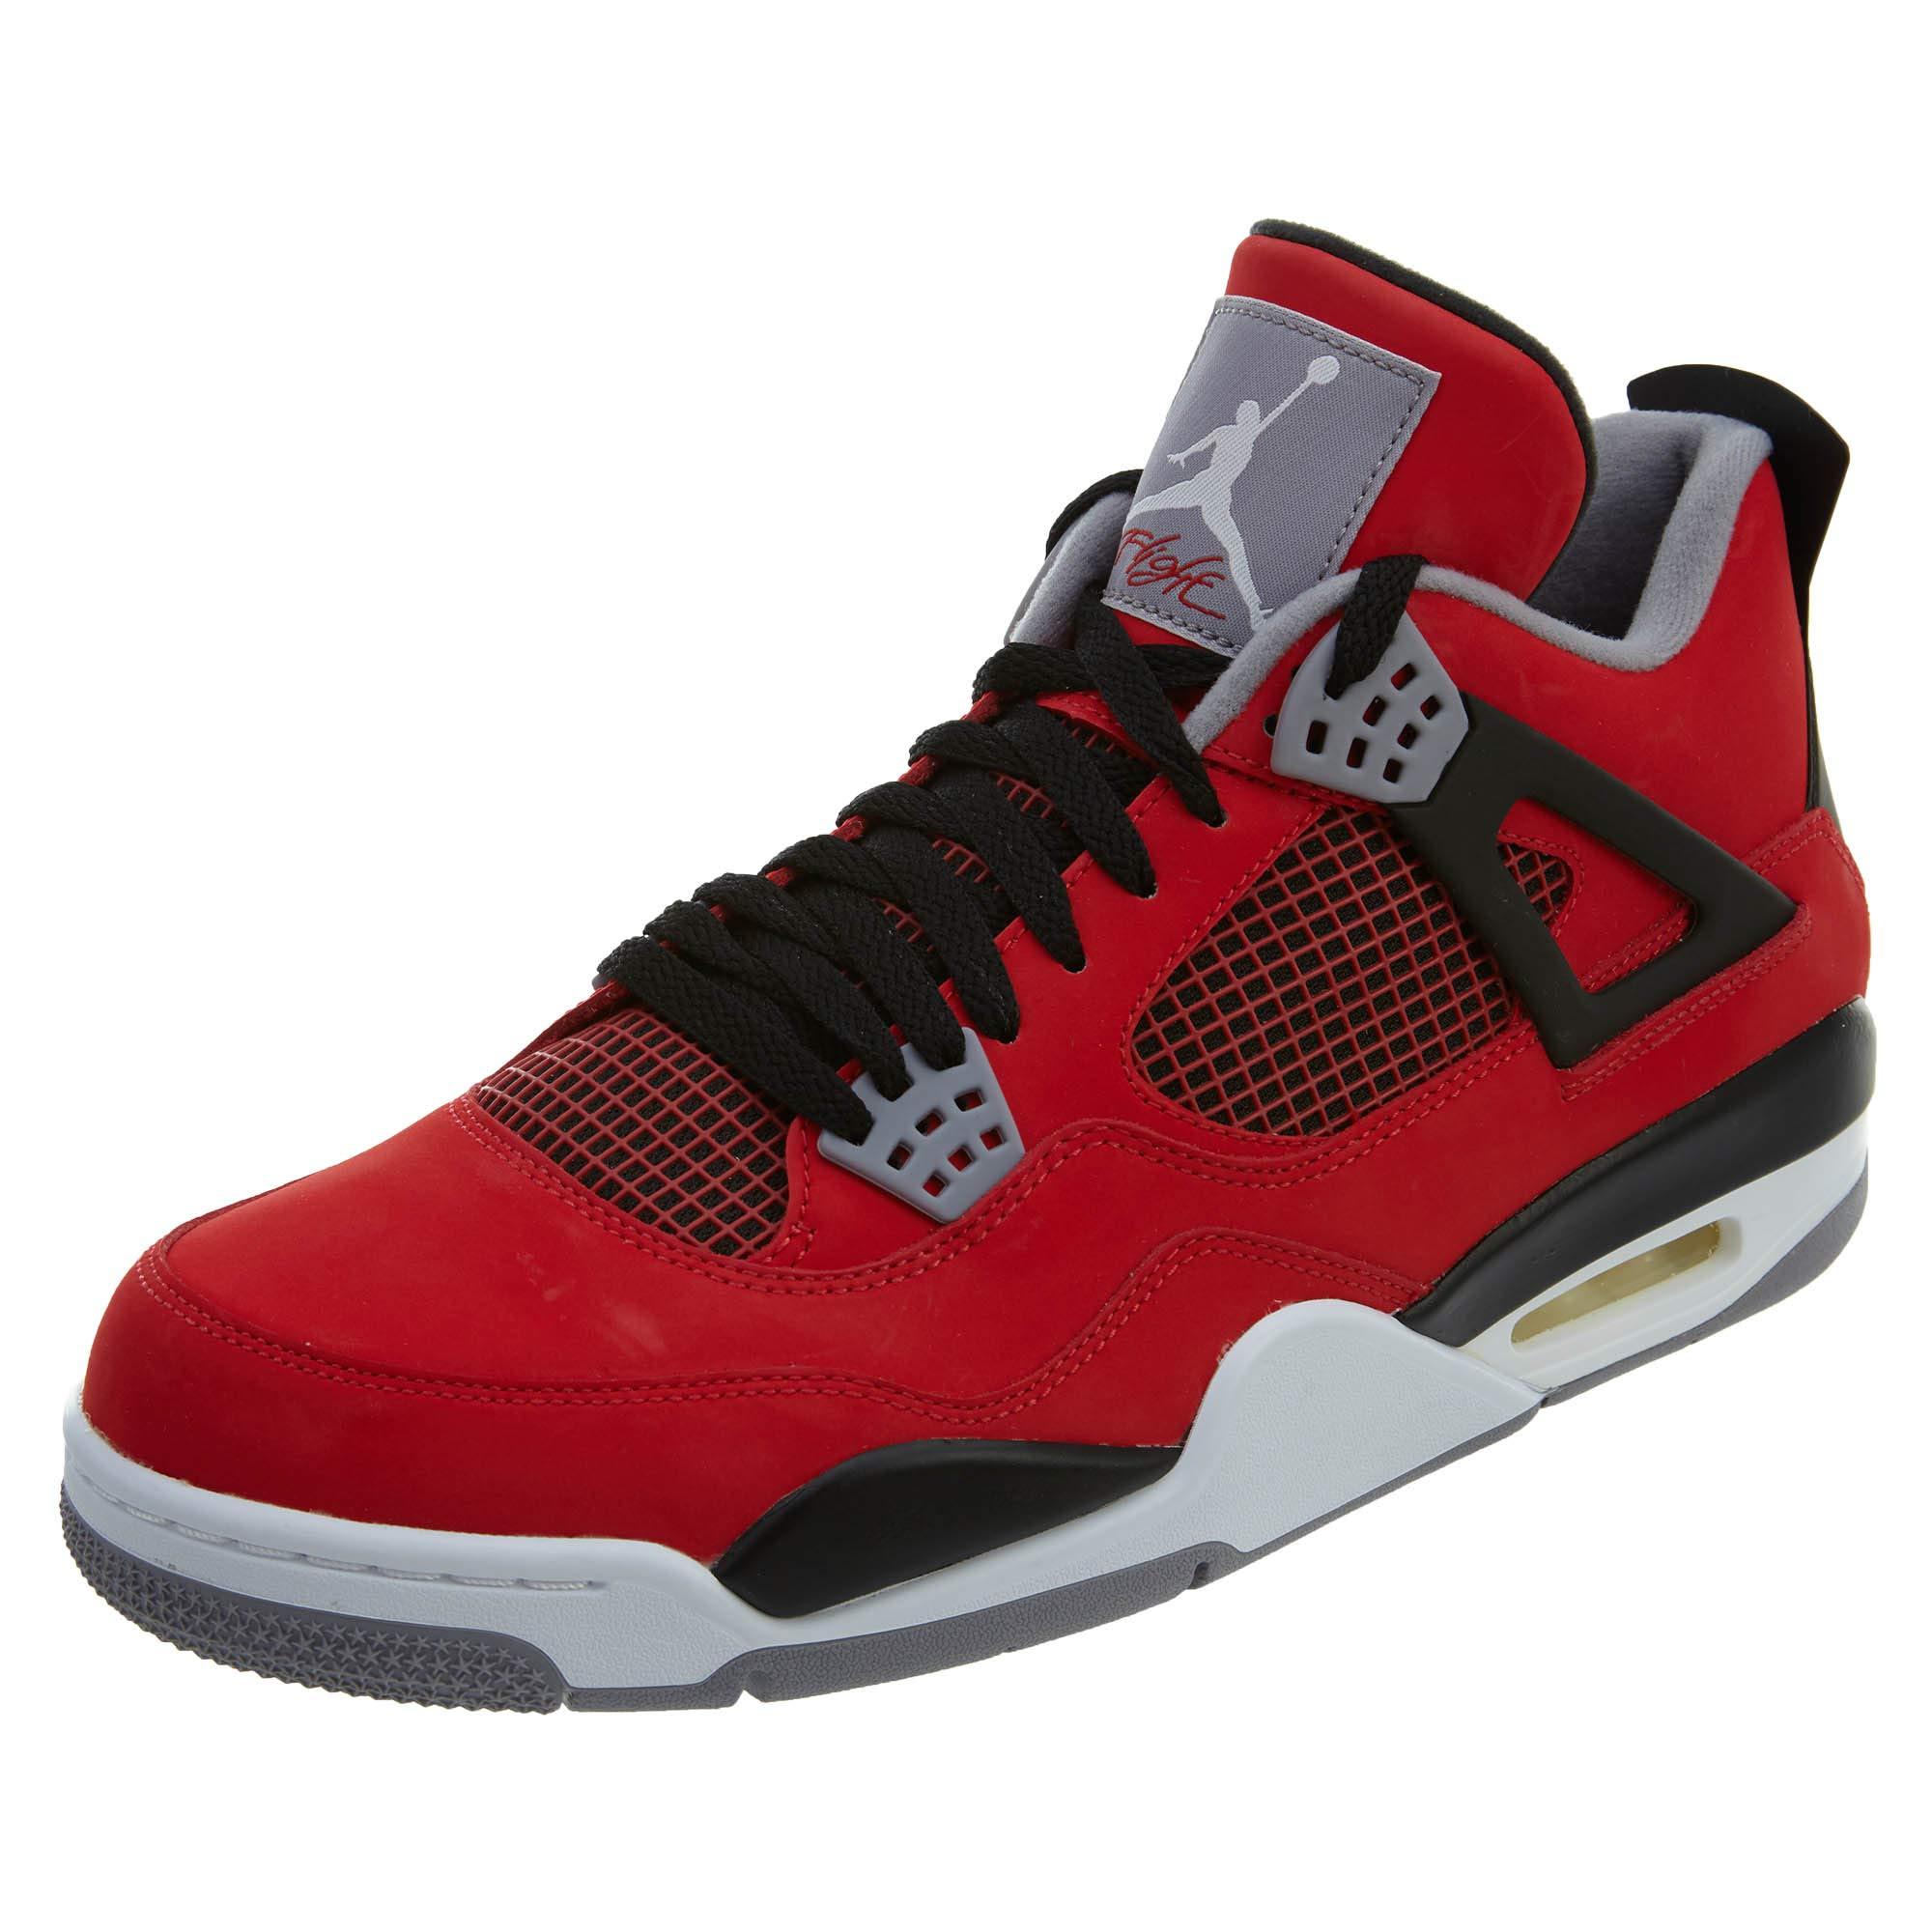 "Air Jordan 4 Retro ""Toro Bravo"" - 308497 603"